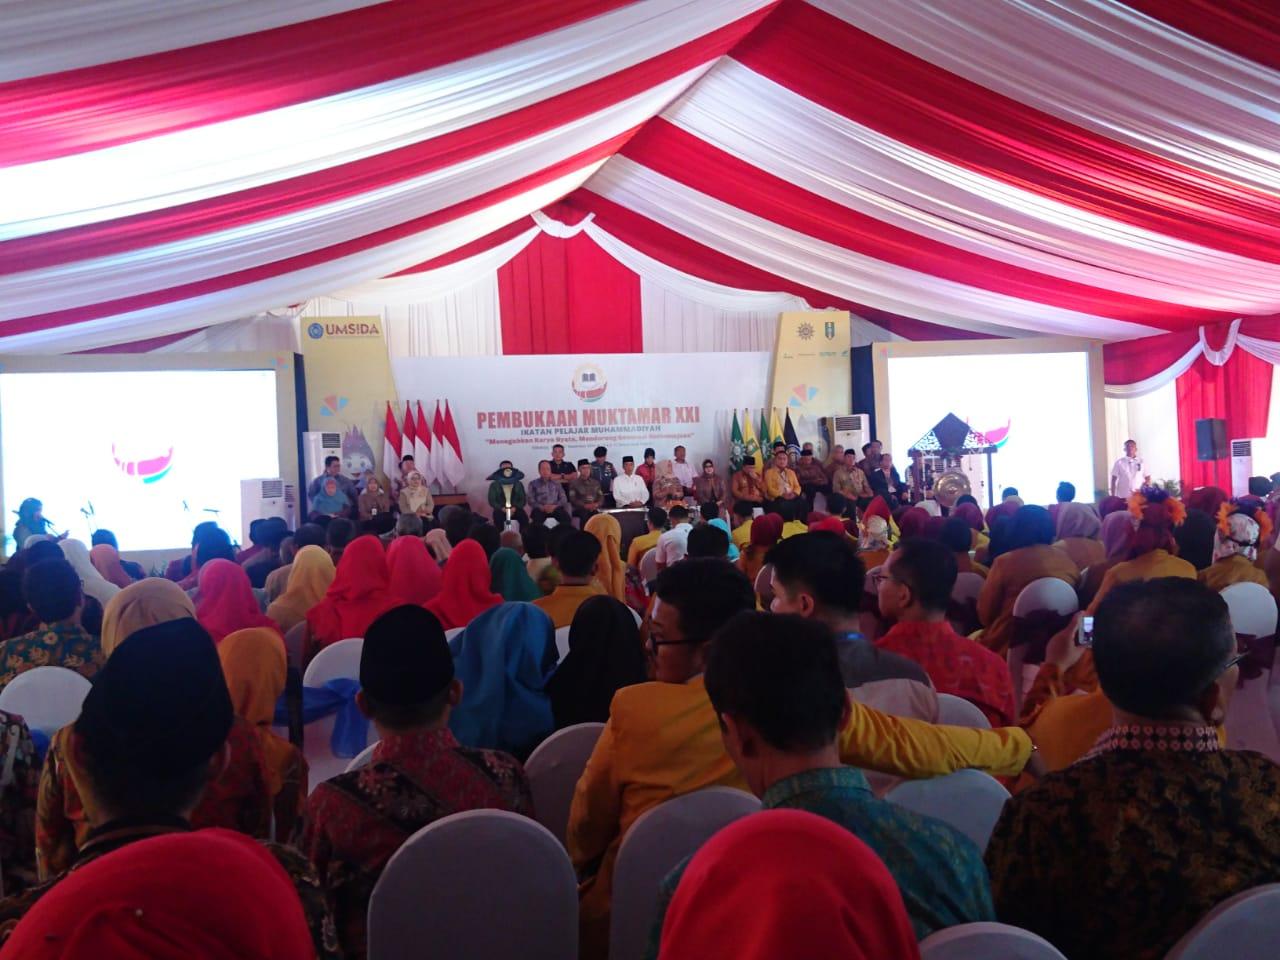 Jokowi Opens Muhammadiyah Students Association Congress